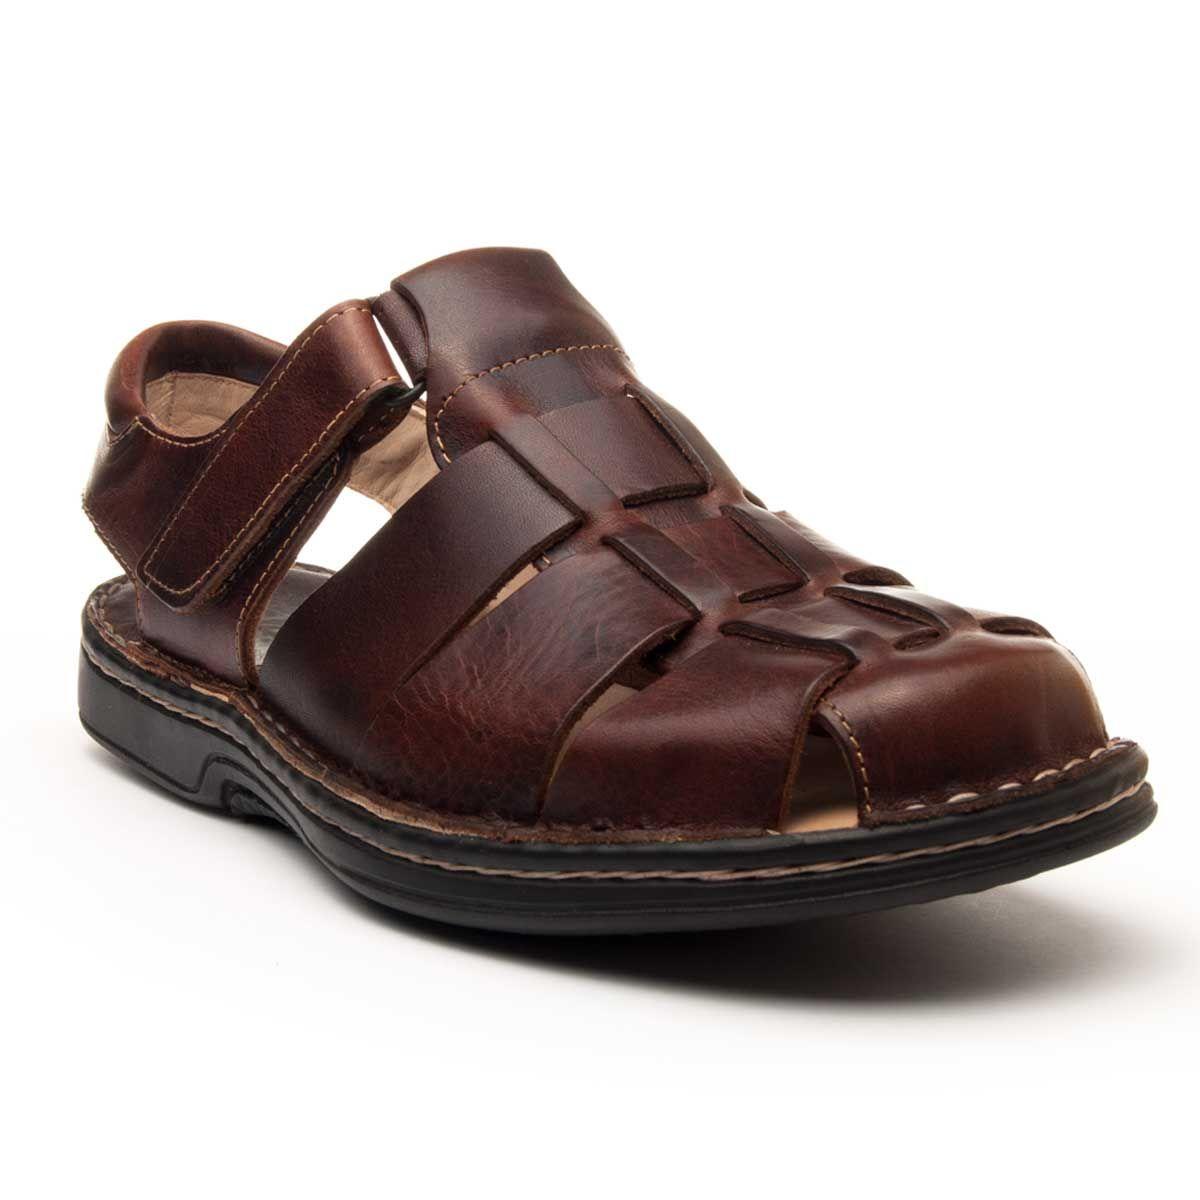 Purapiel Comfortable Sandal in Brown